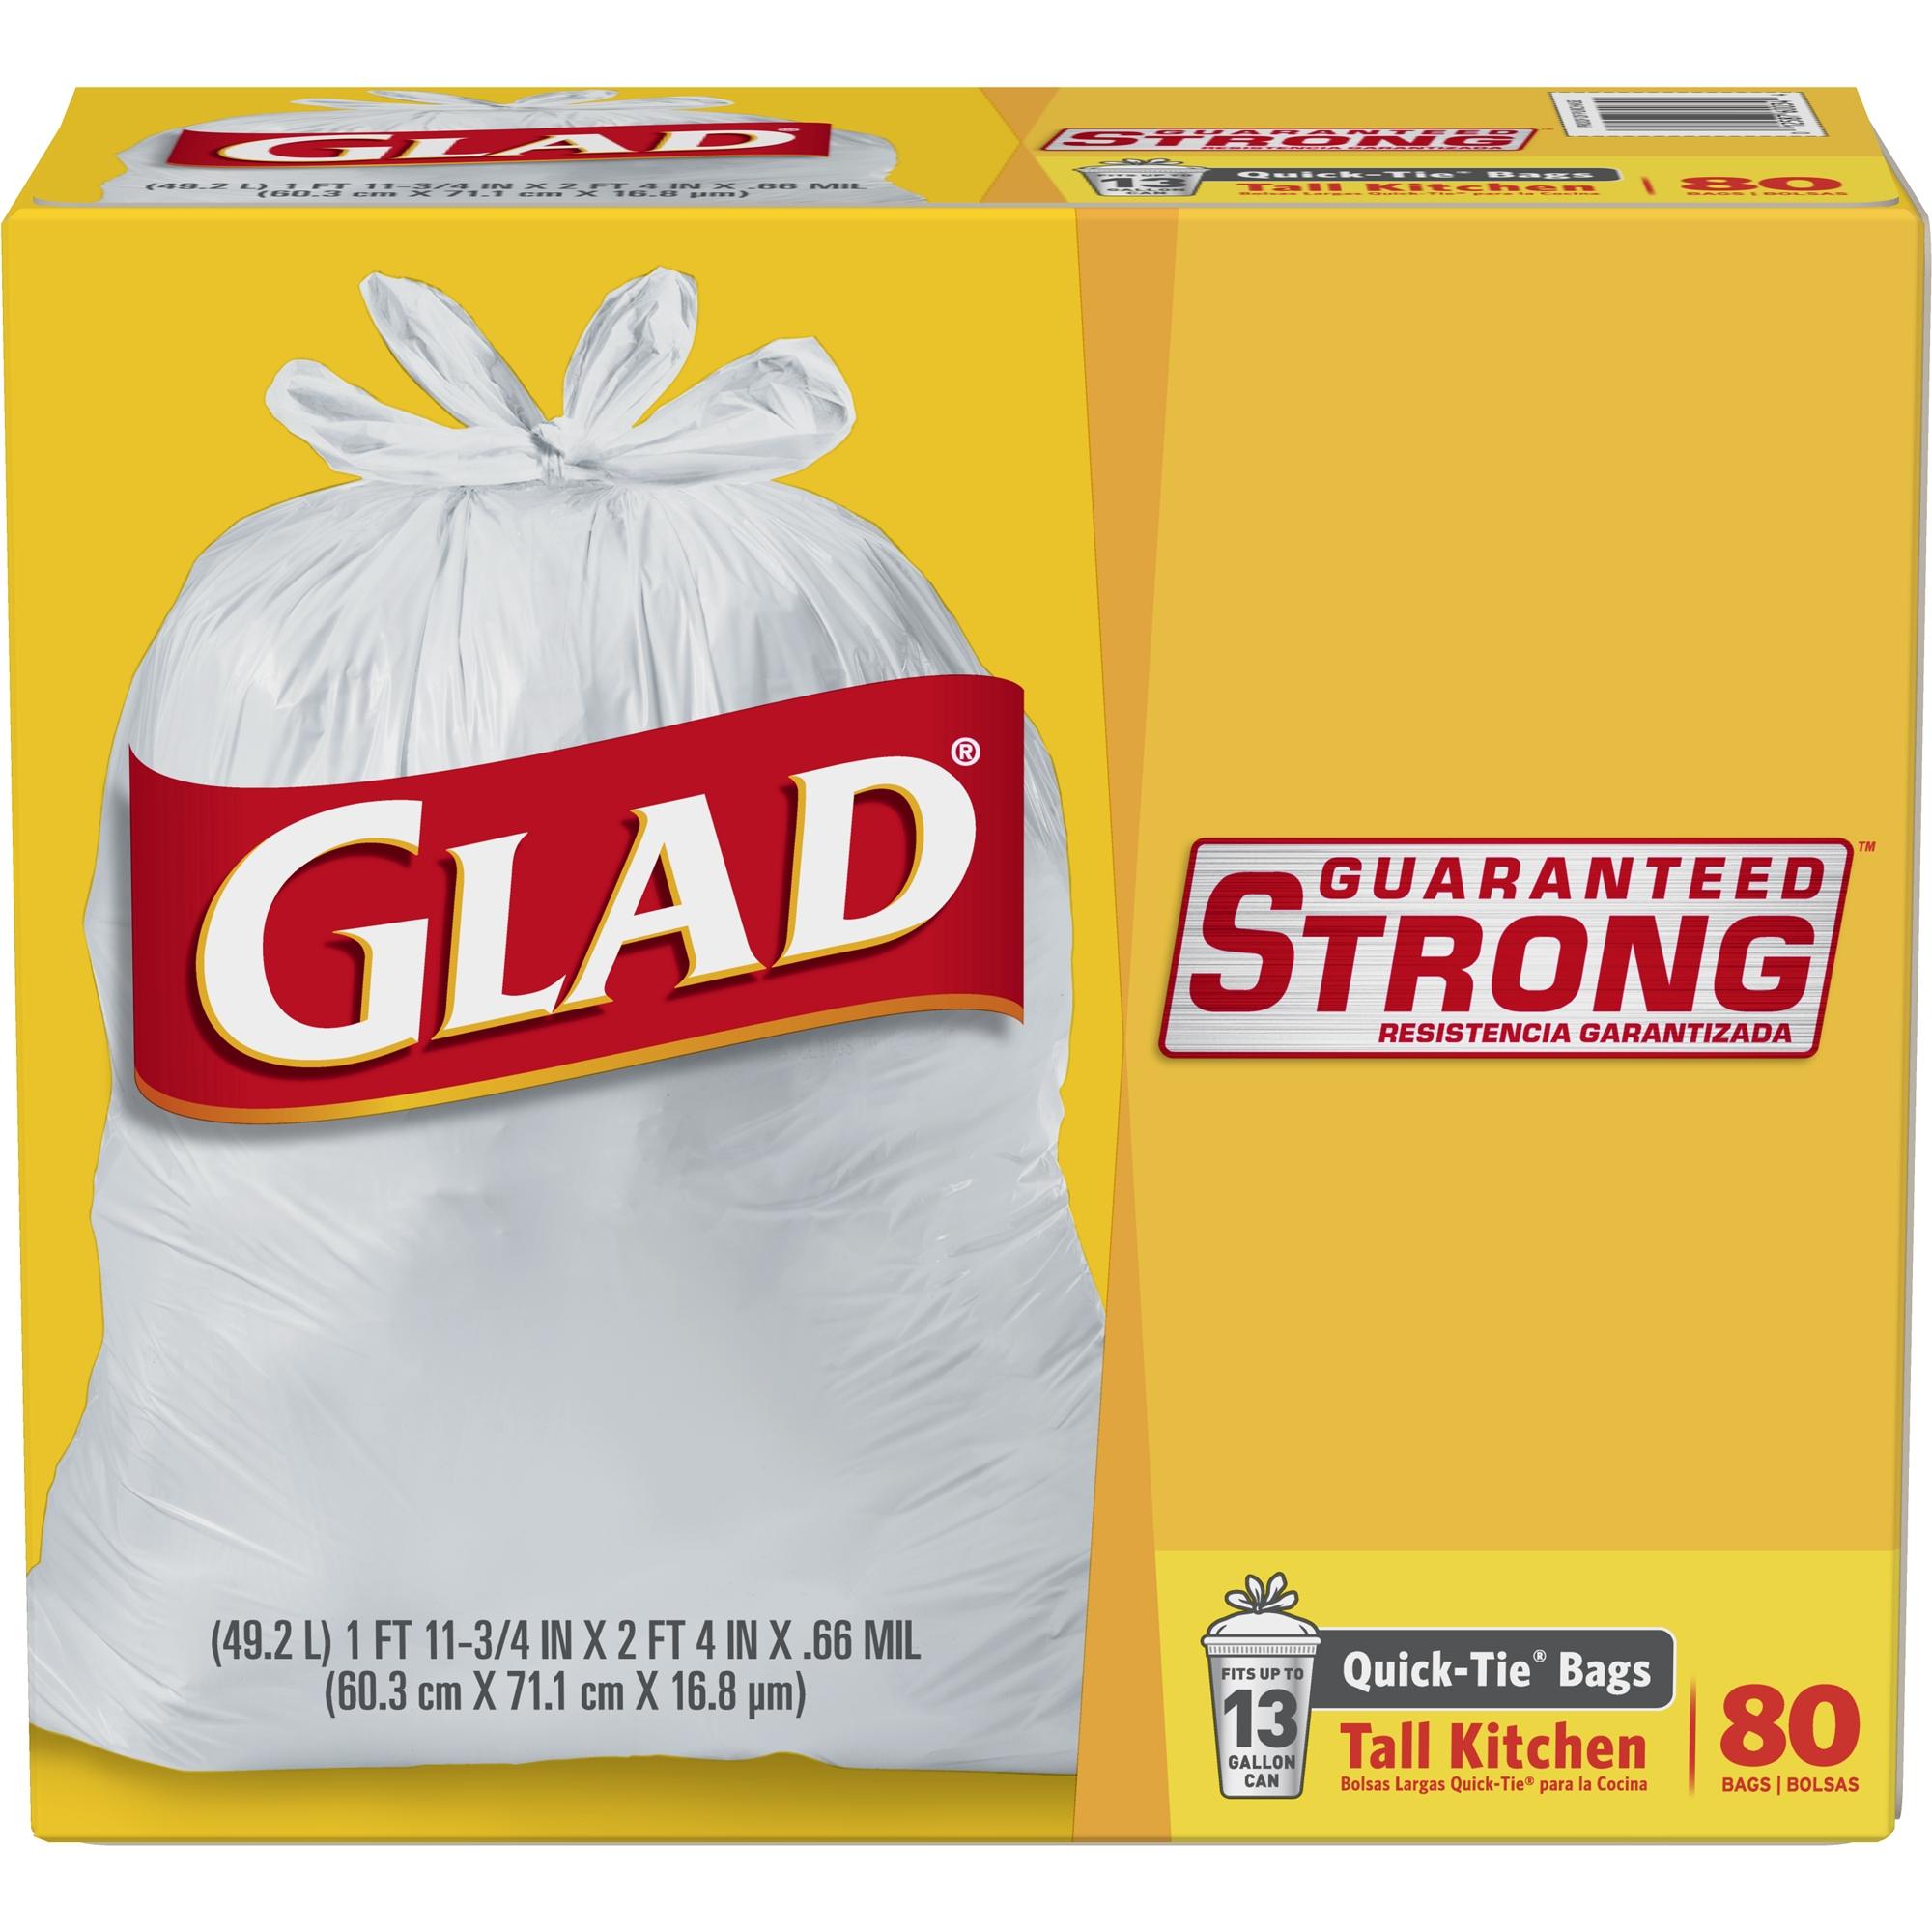 Glad Tall Kitchen Quick-Tie Trash Bags, 13 Gallon, 80 Count